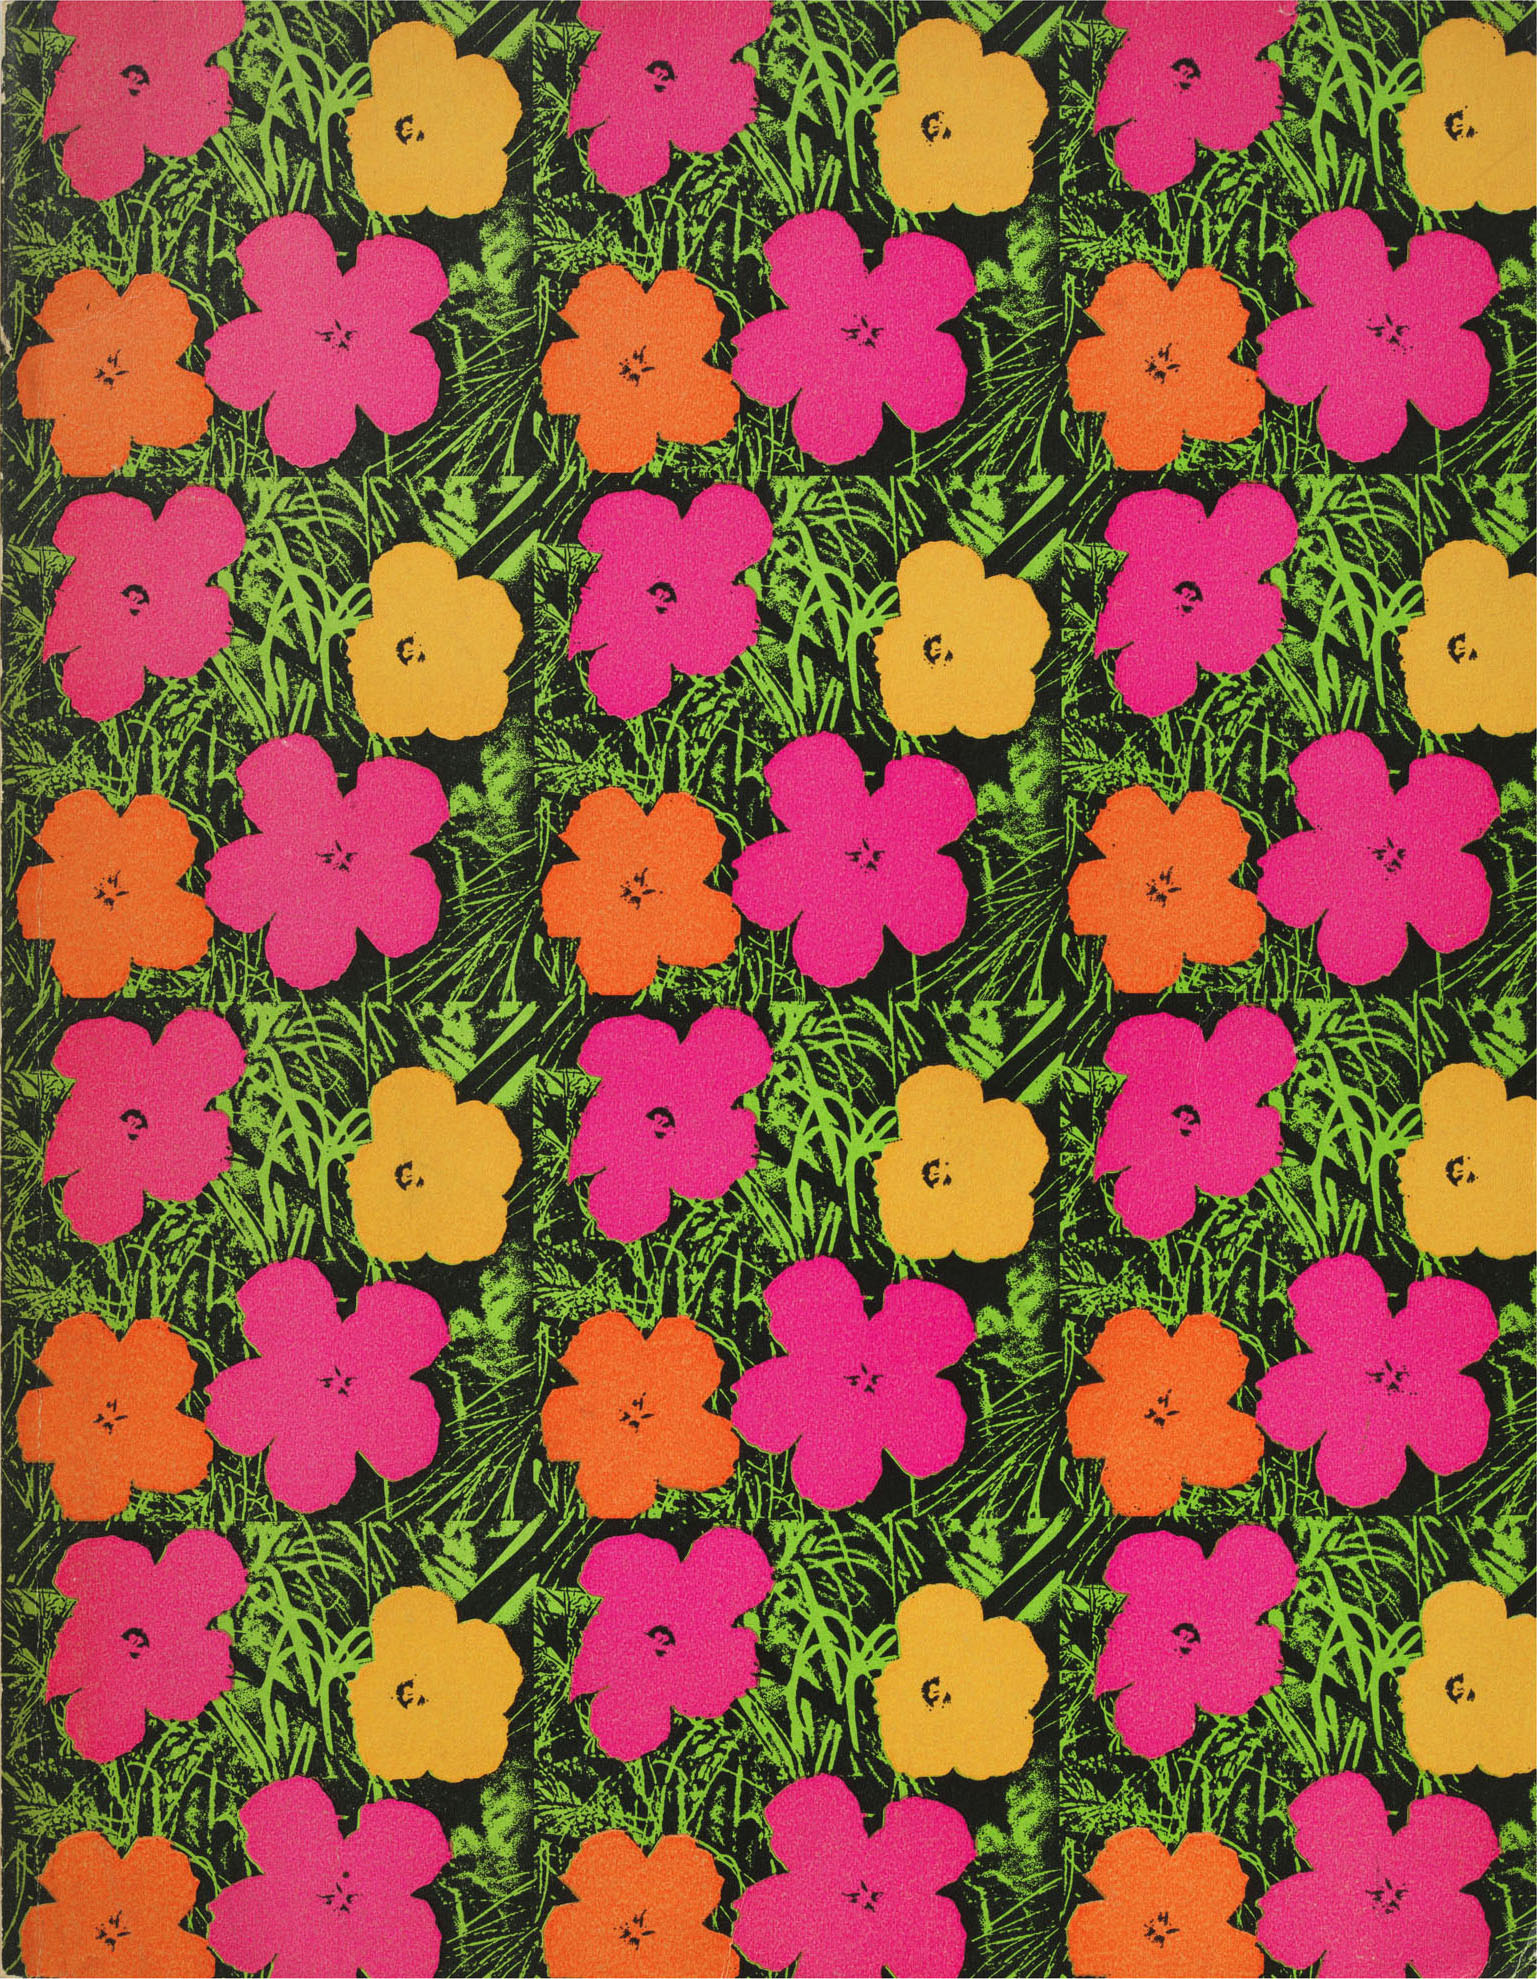 2013-09-24-Warhol_CoverStockholm.jpg